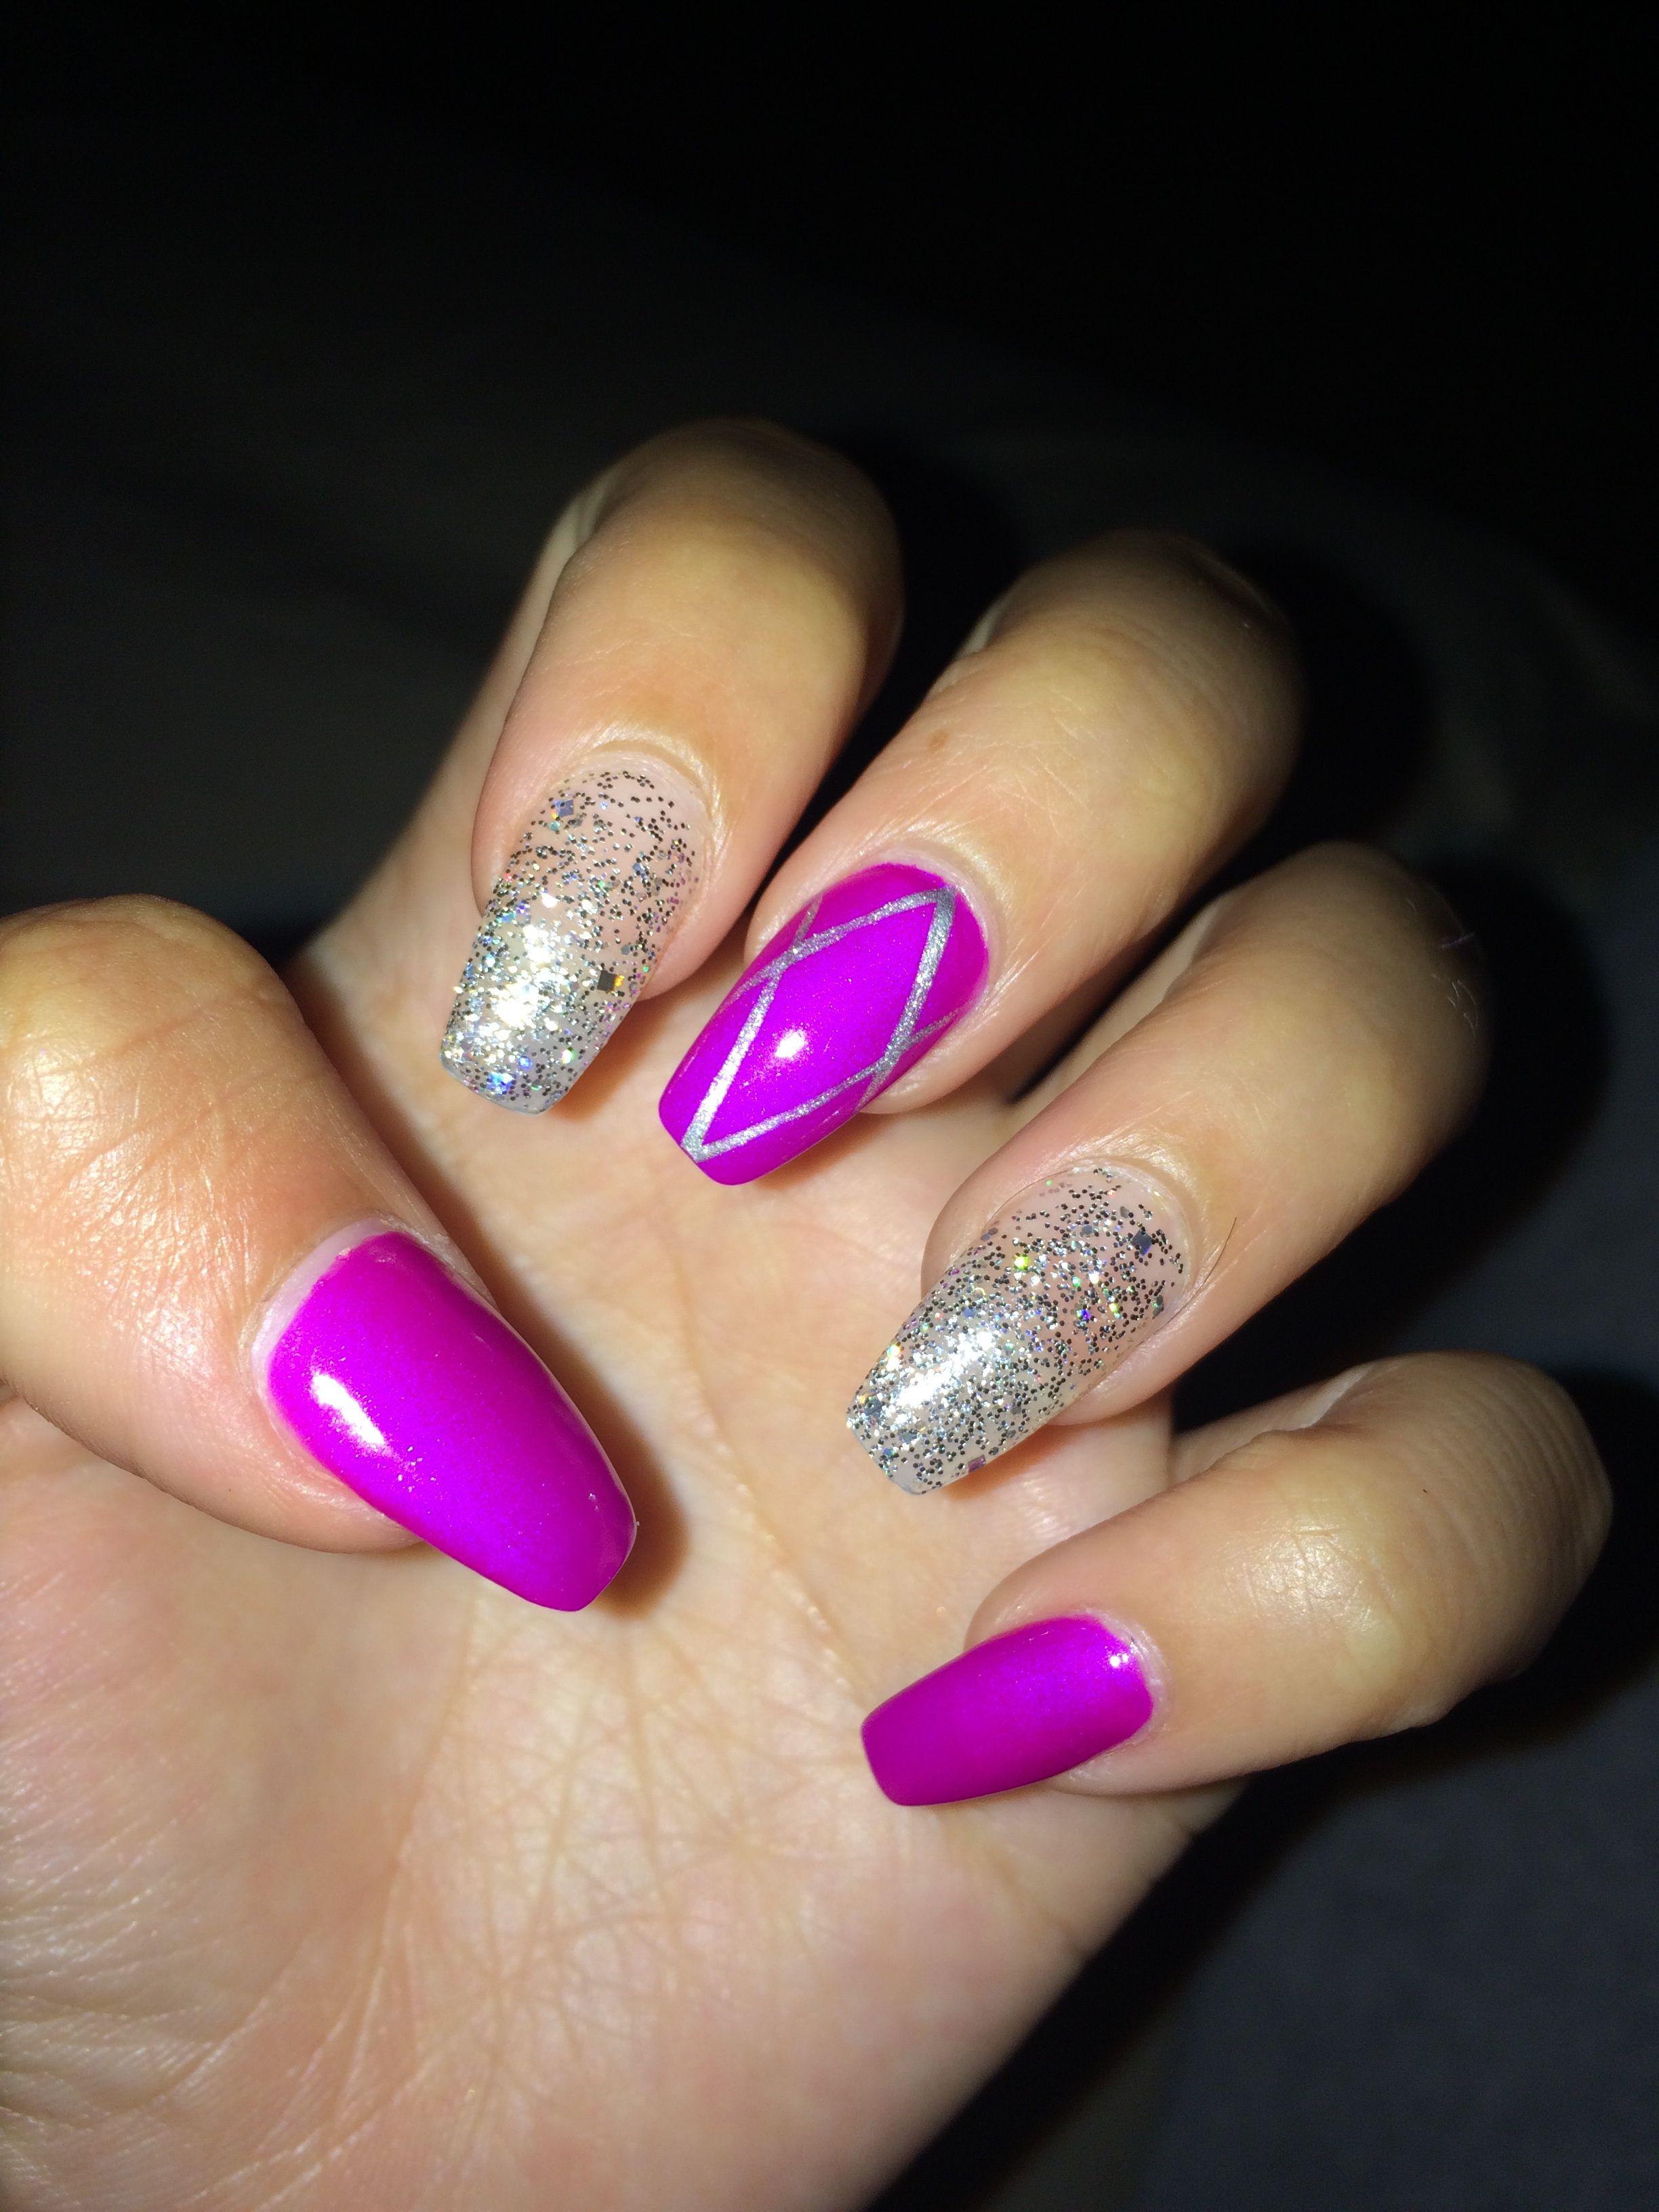 Coffin nails!! #coffinnails #coffin #nails #cute #purple # ...